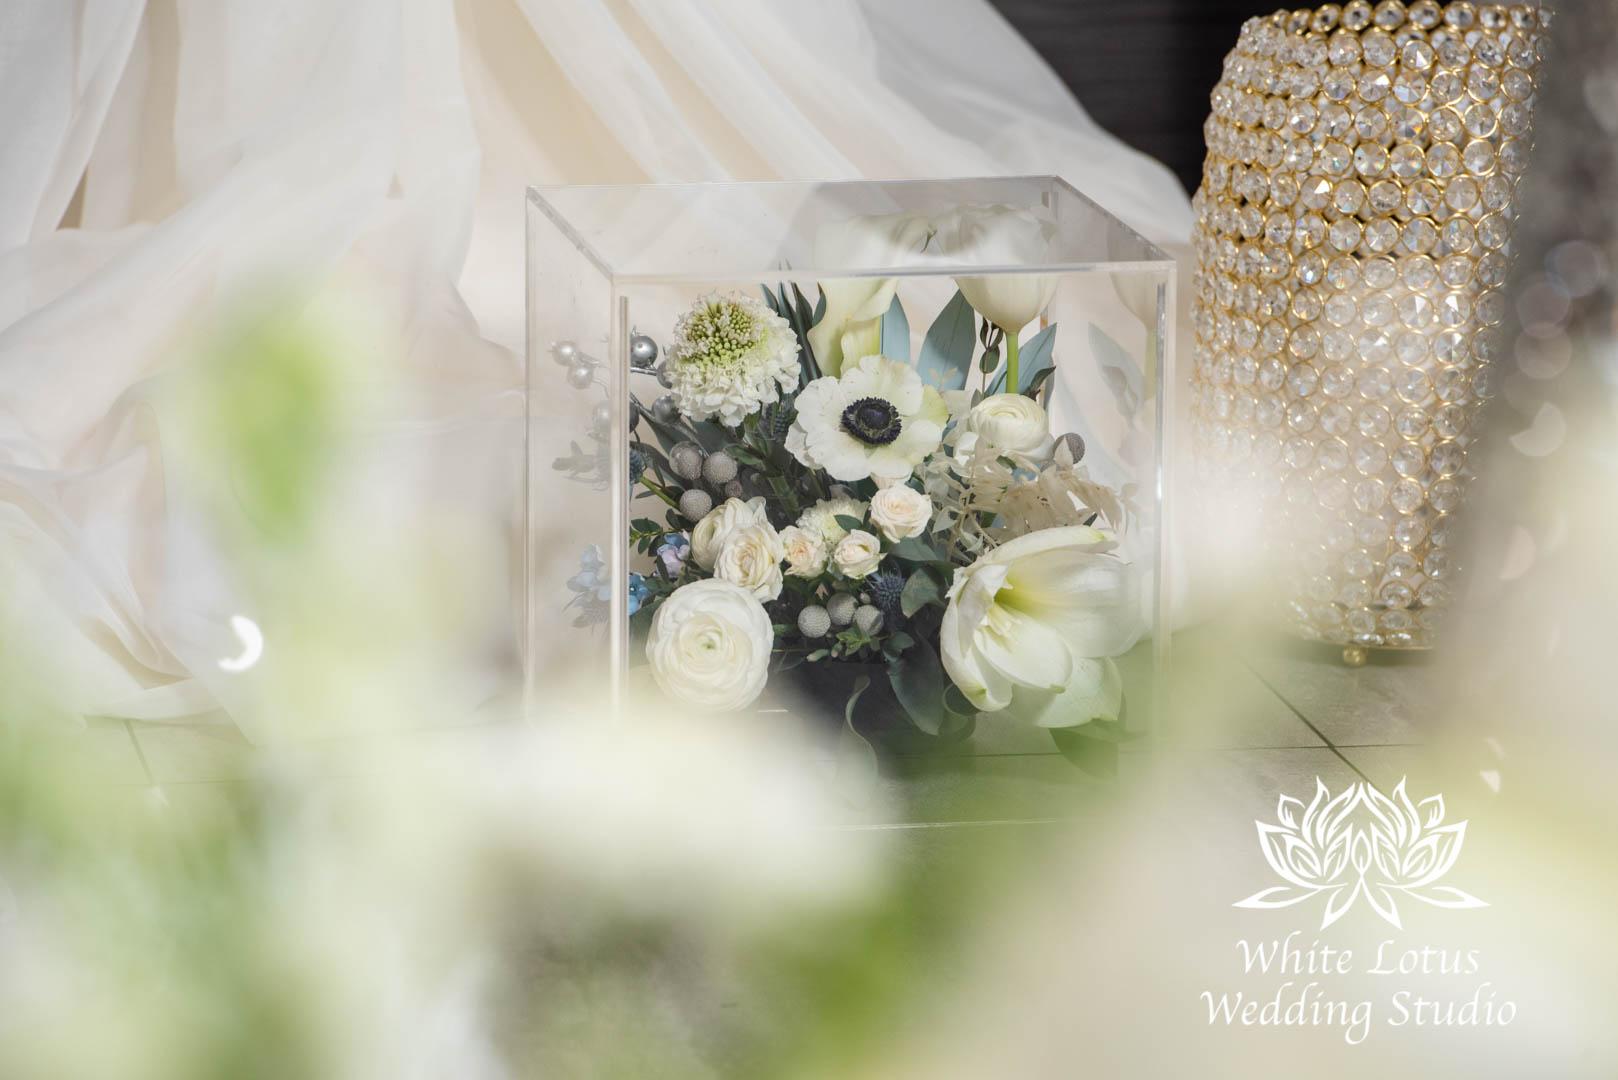 038- GLAM WINTERLUXE WEDDING INSPIRATION